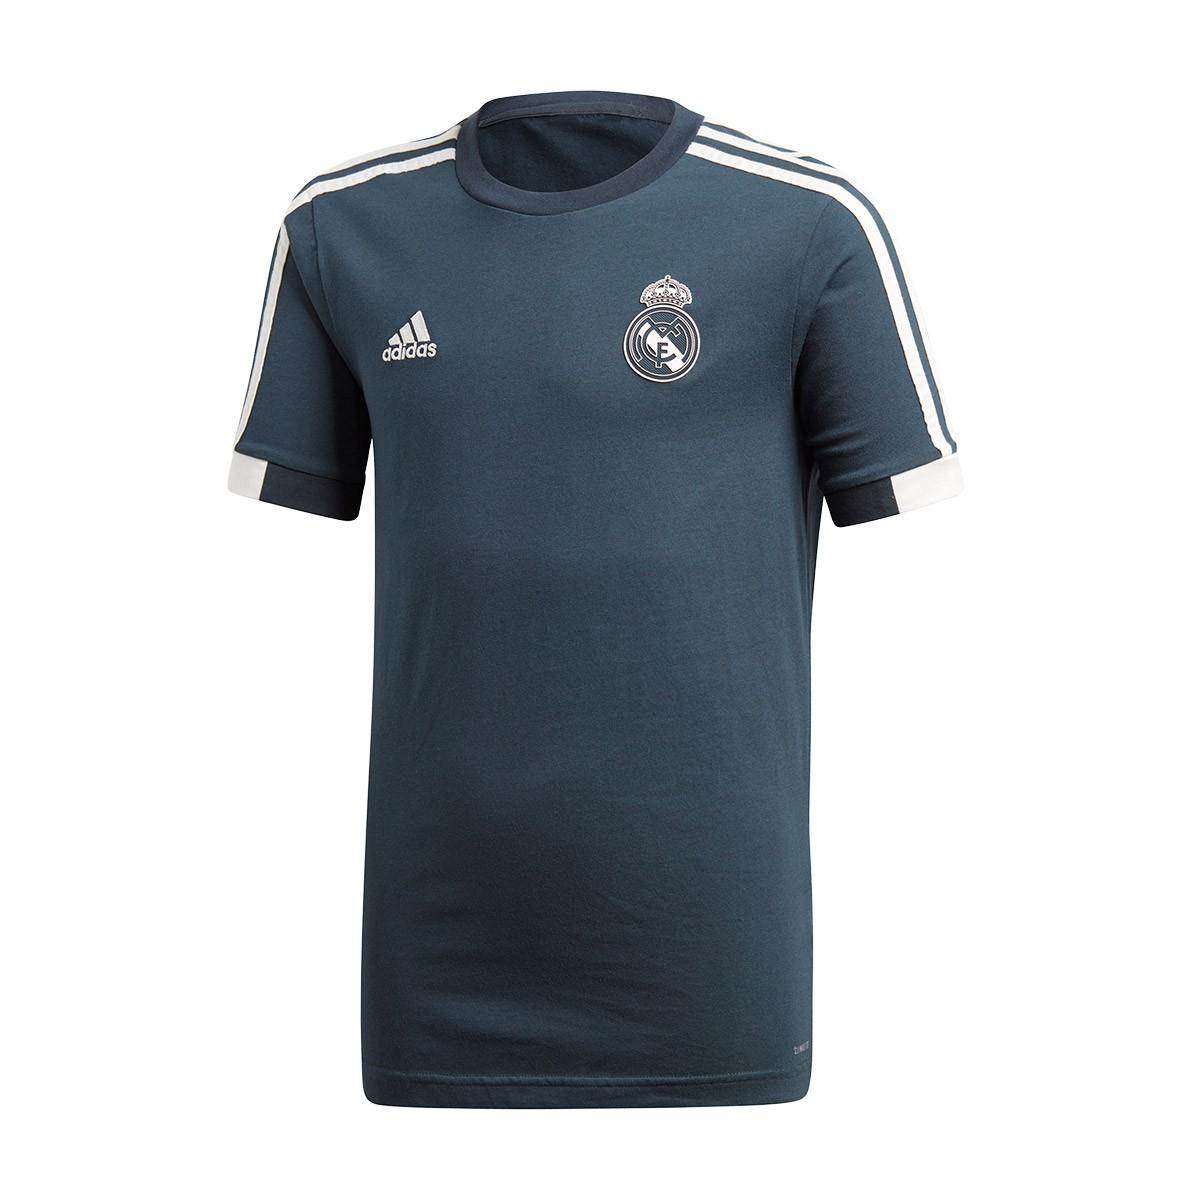 06e9ae28c Jersey adidas Kids Real Madrid 2018-2019 Tech onix-Black-Core white ...